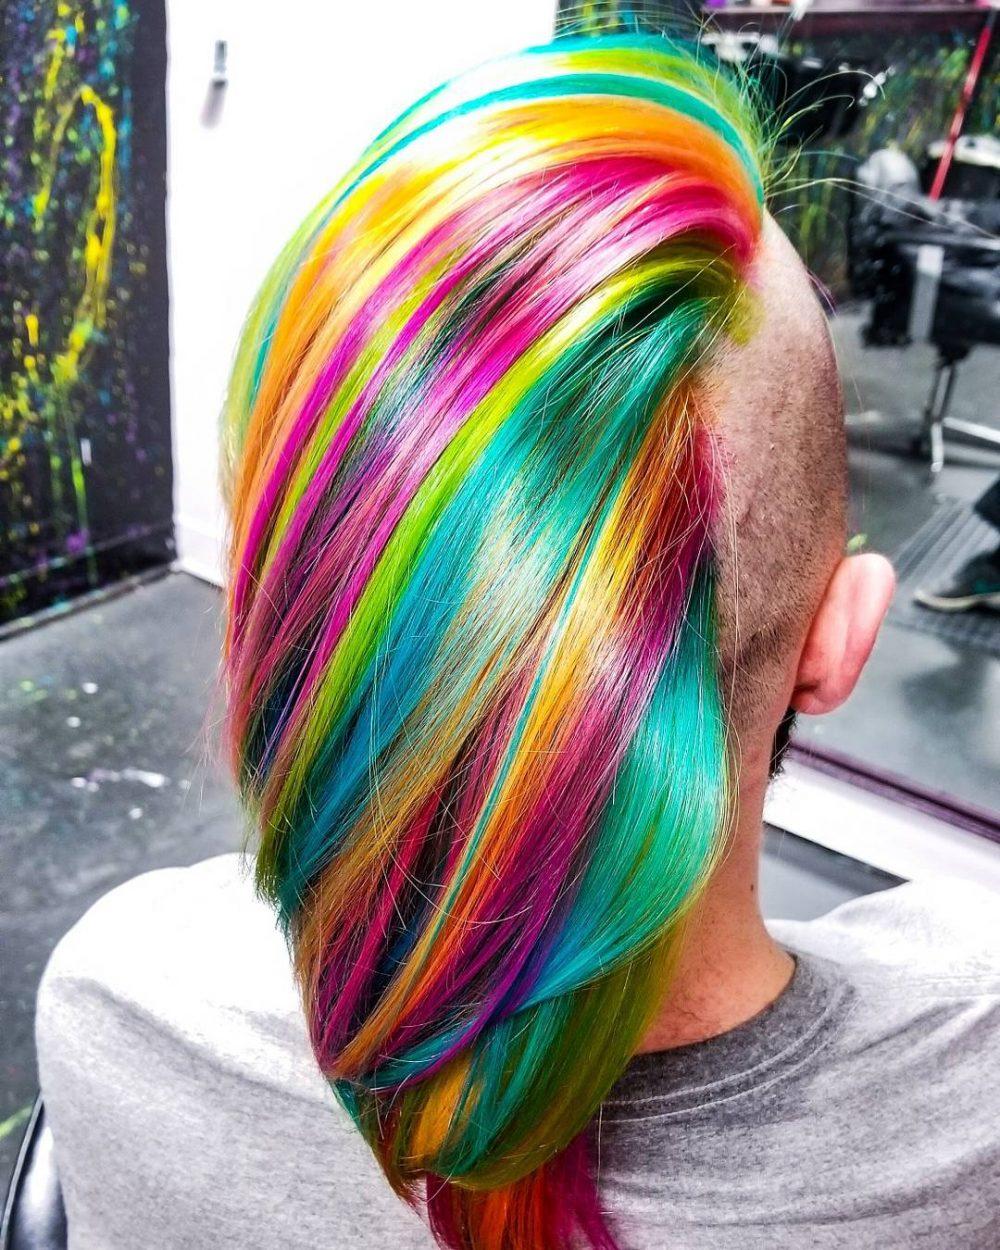 Fruit Stripe Gum hairstyle